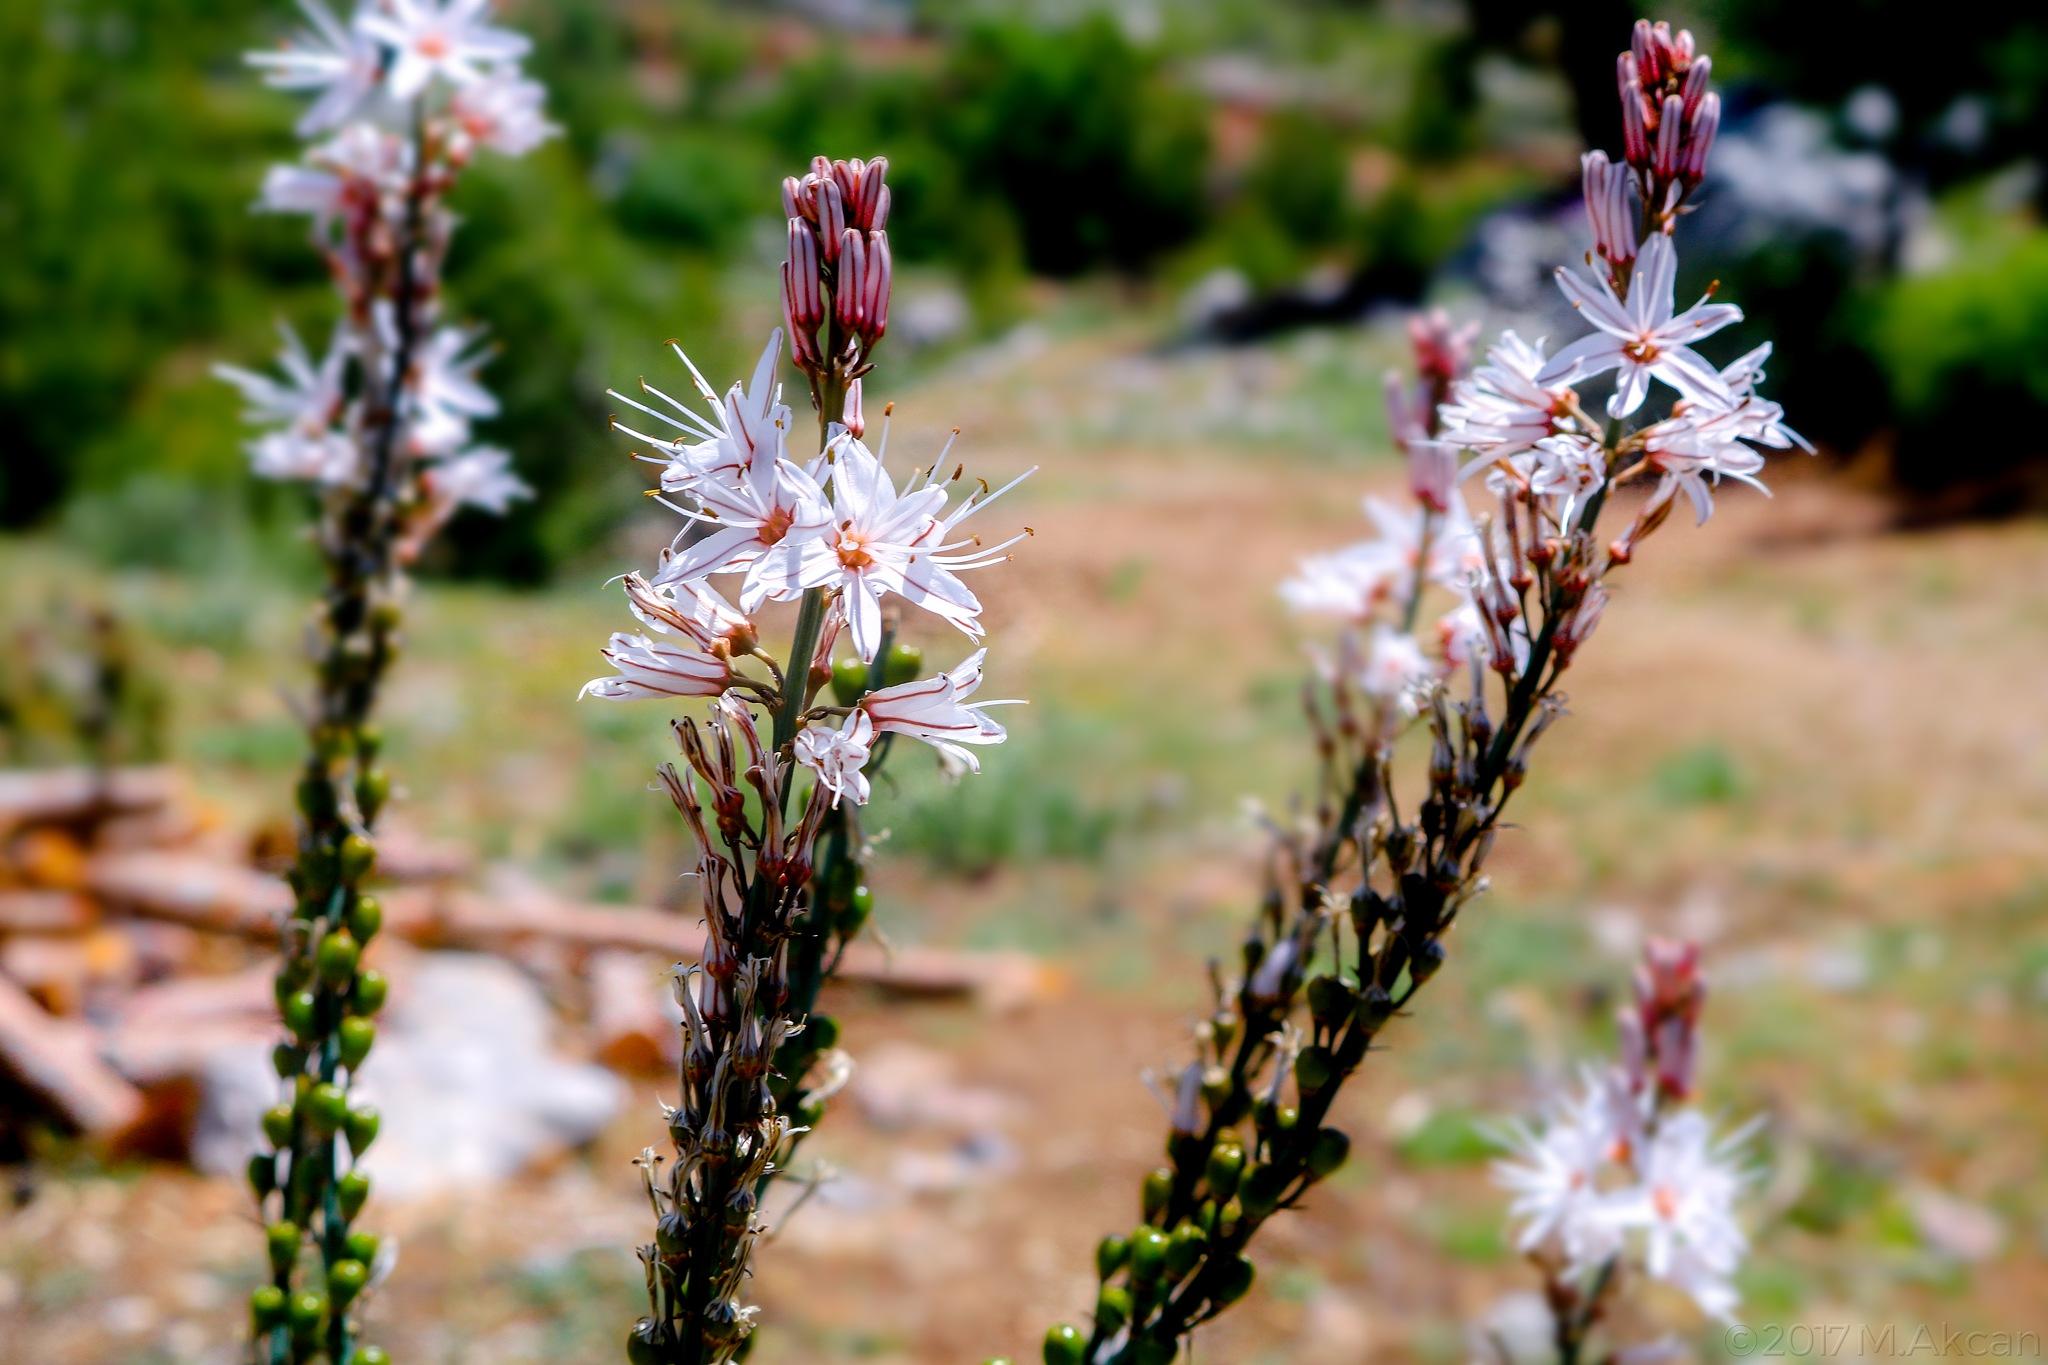 Flowers by Mesut Akcan